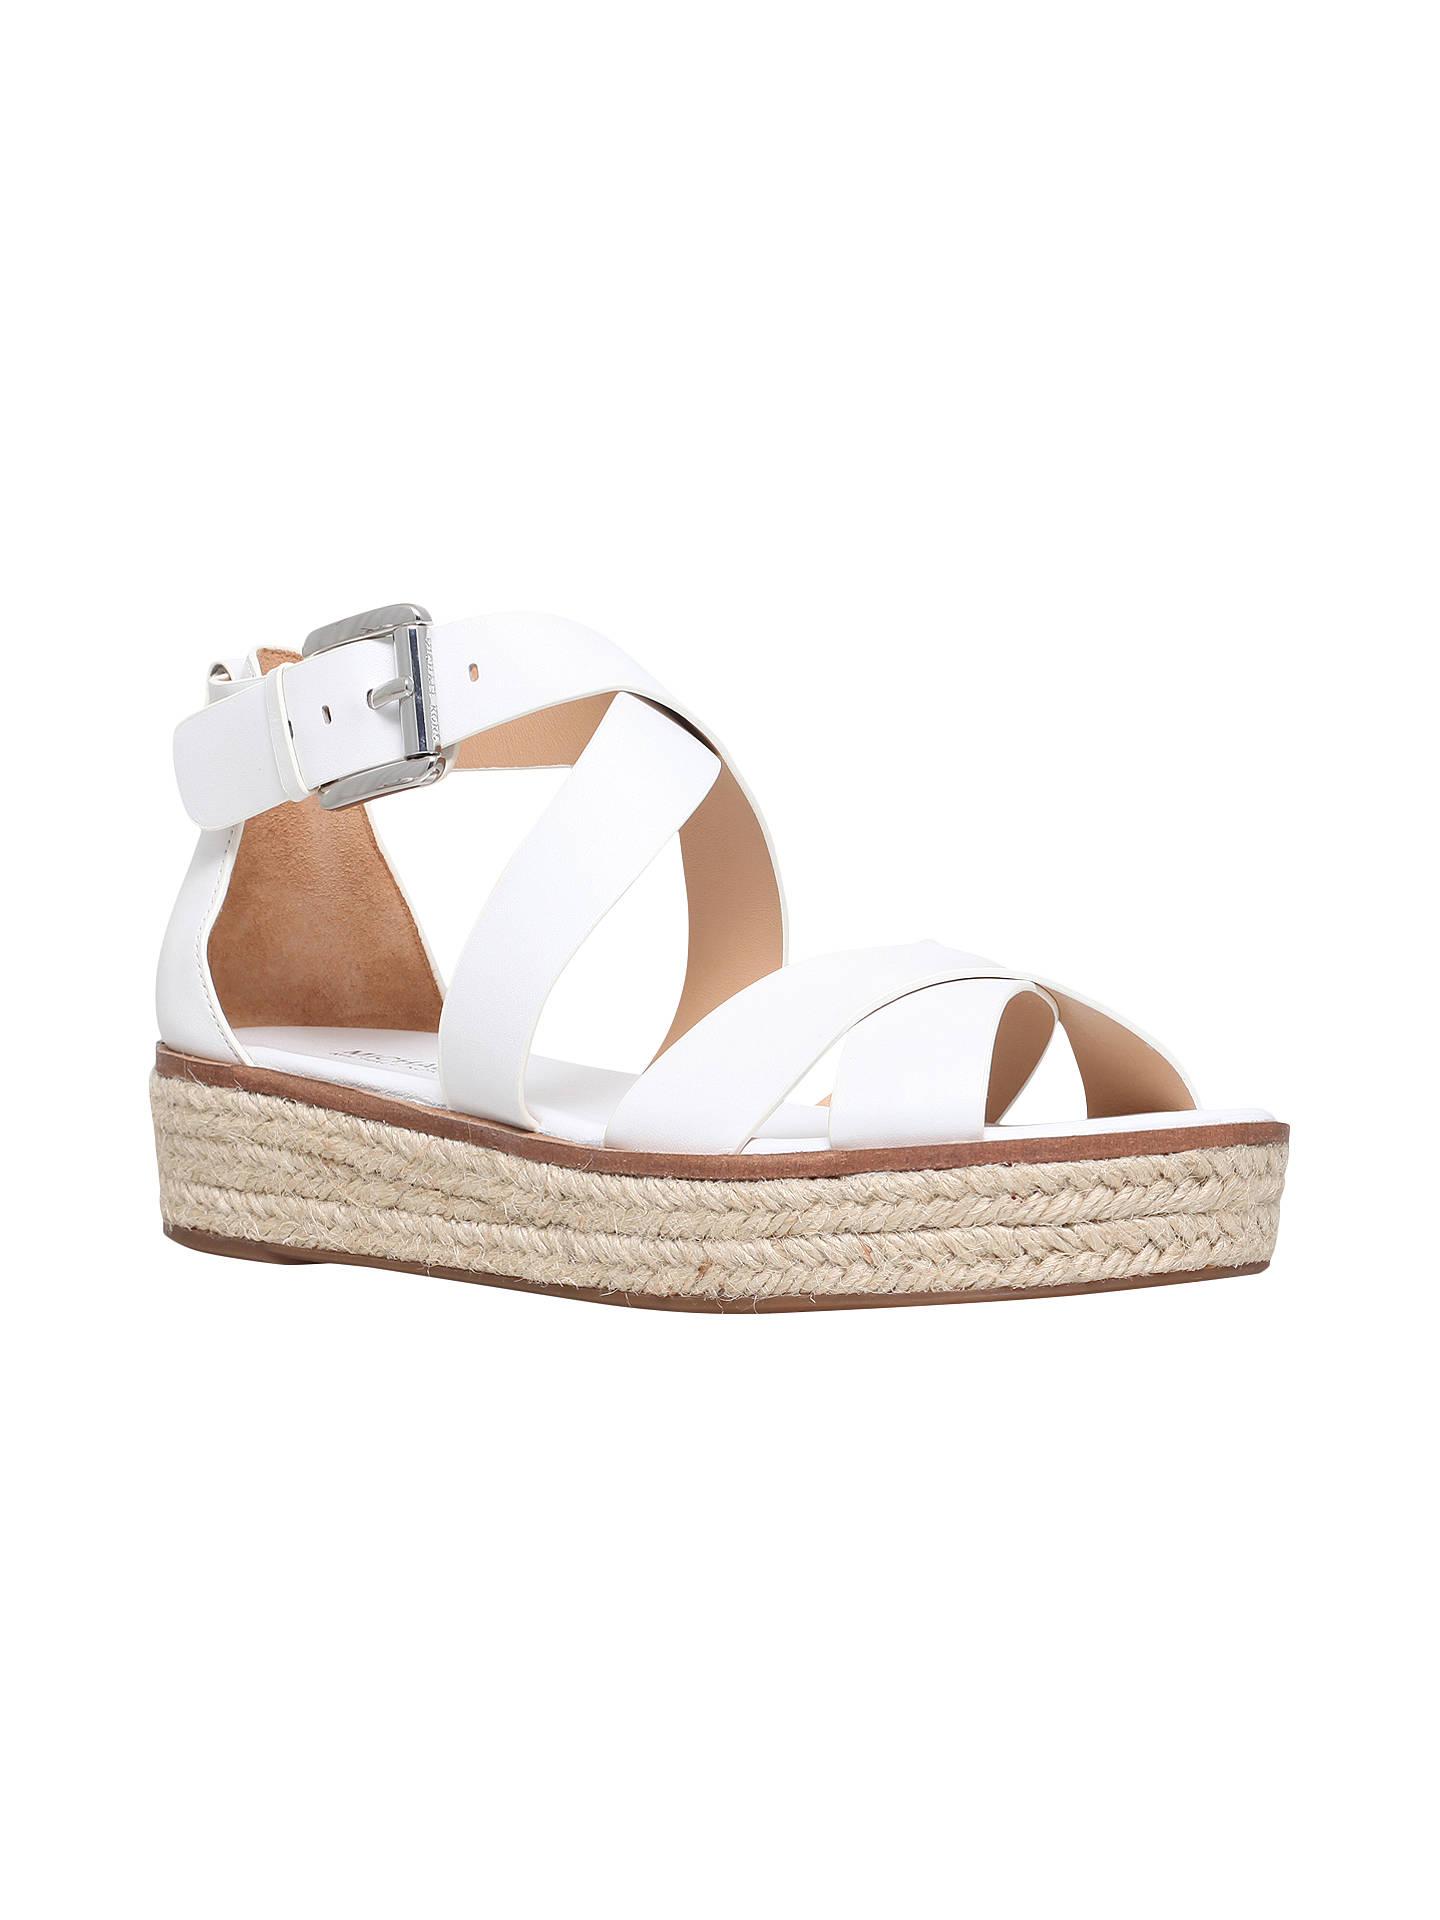 ba29118f5868 MICHAEL Michael Kors Darby Flatform Sandals at John Lewis   Partners